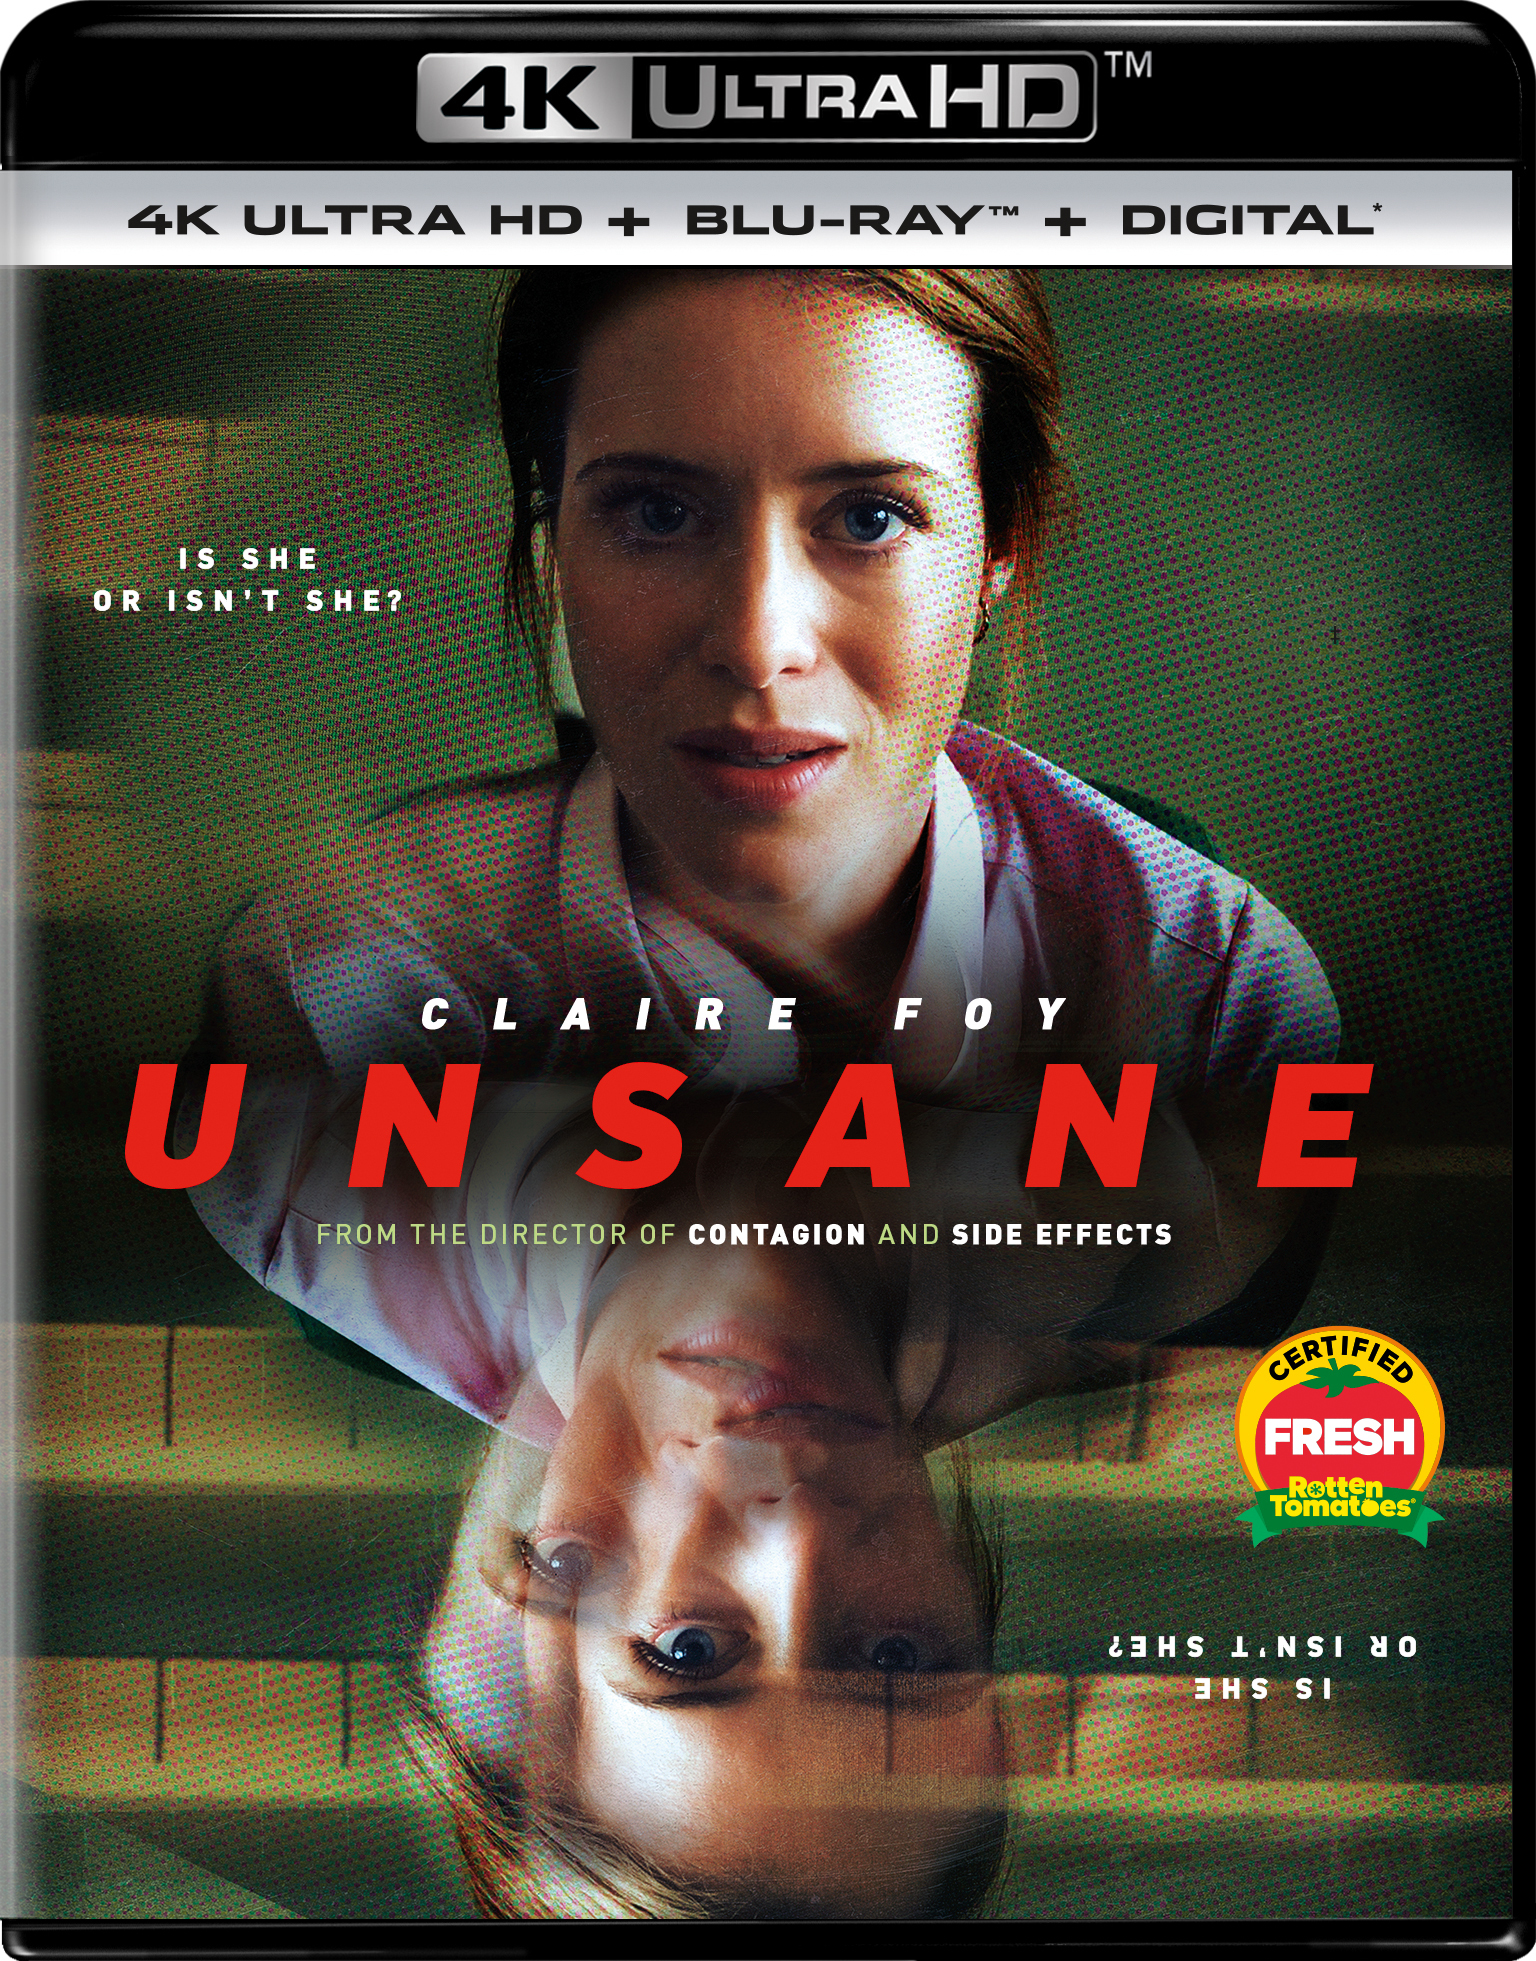 Unsane 4K (2018) Ultra HD Blu-ray